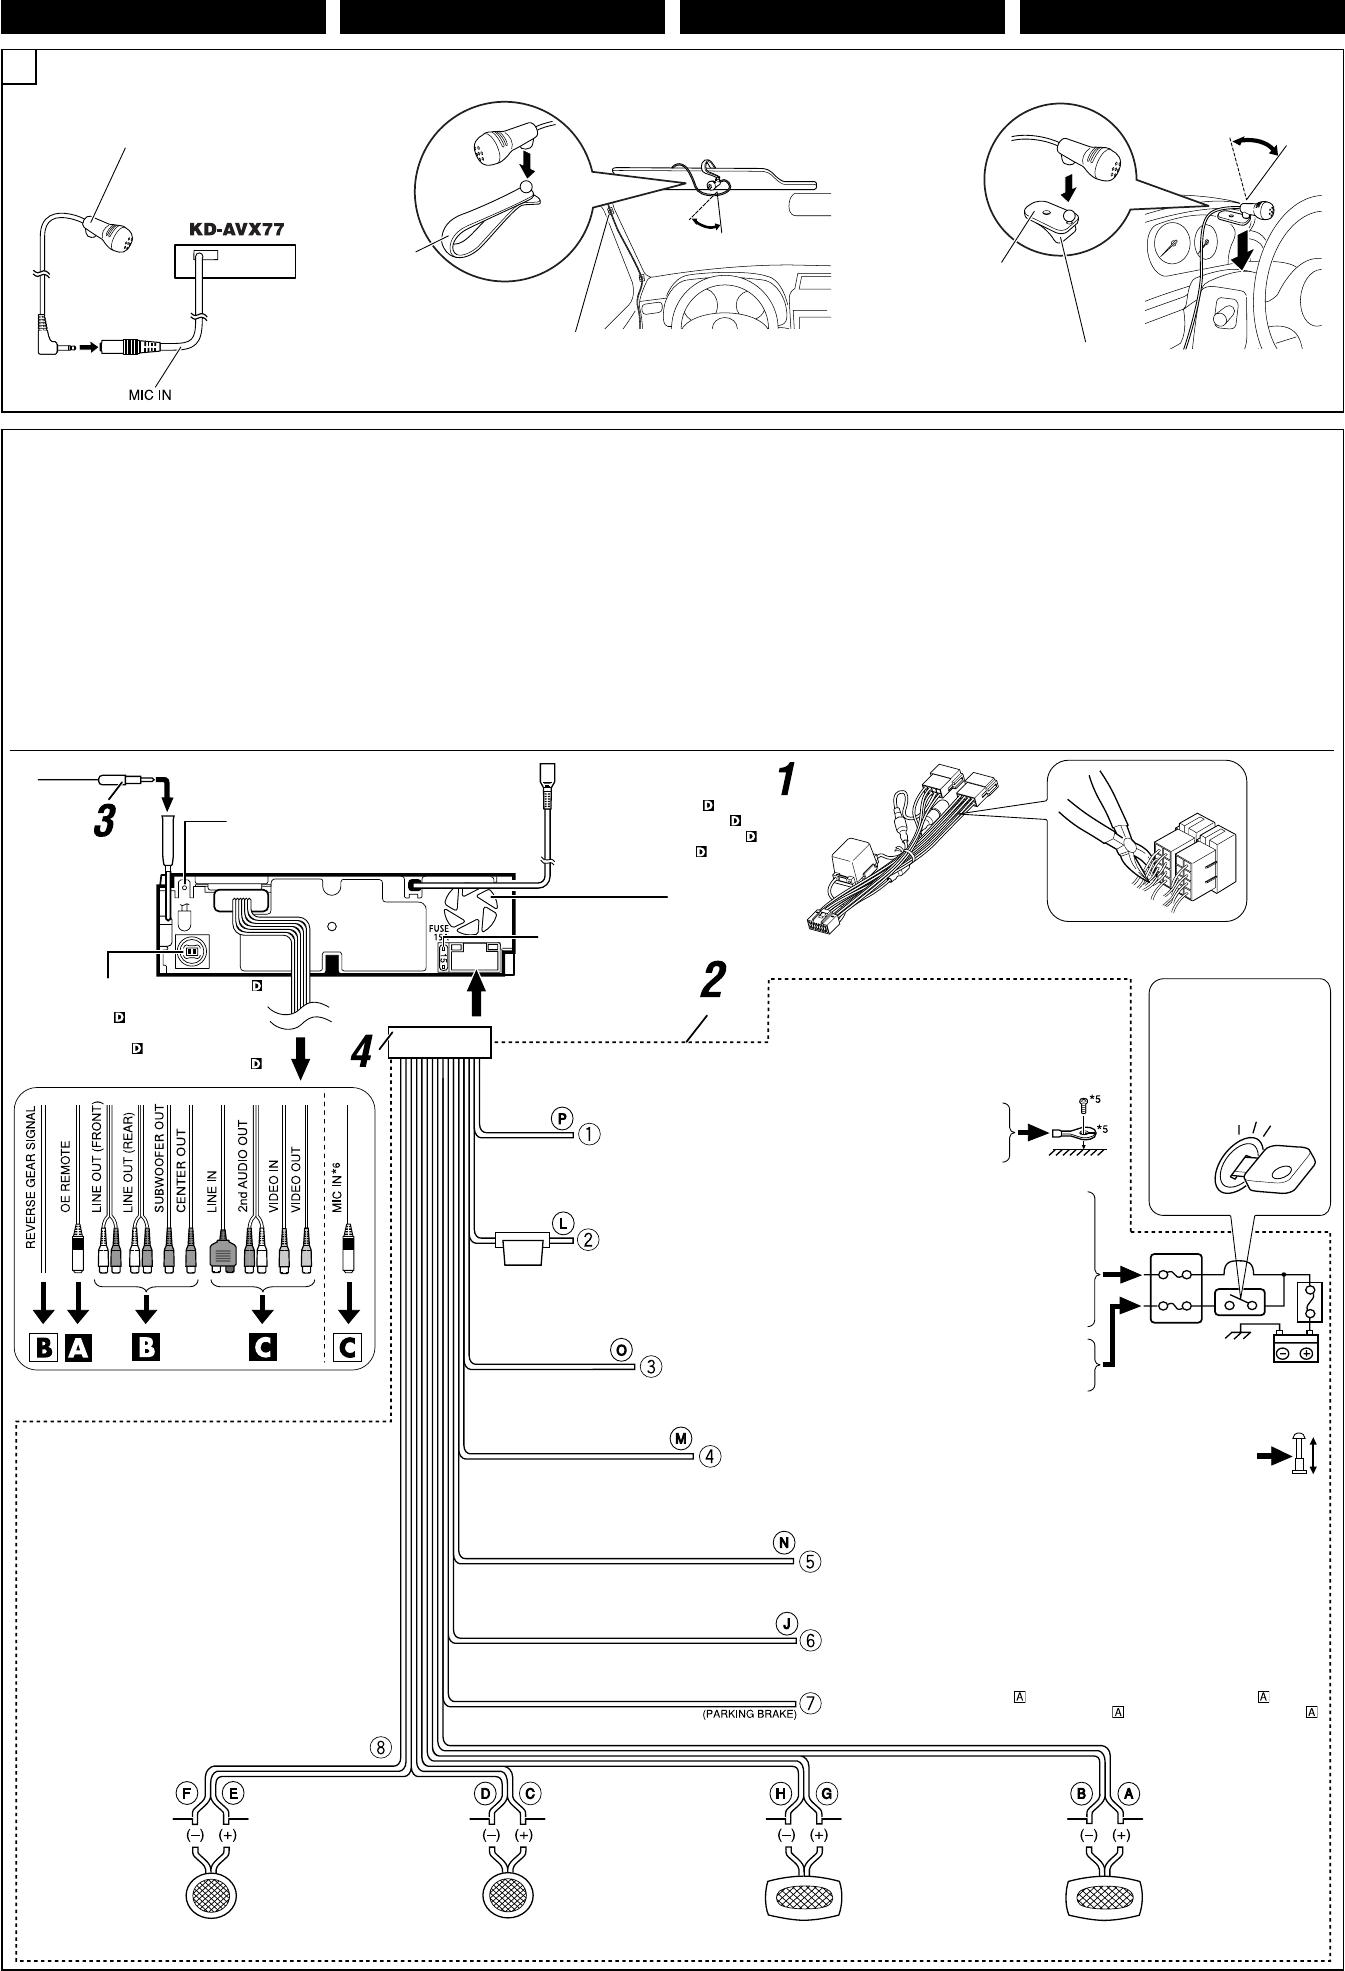 Jvc Kd Avx40 Car Stereo Wiring Harnes - Harness Jvc Diagram Wiring Radio Fojvcsr on